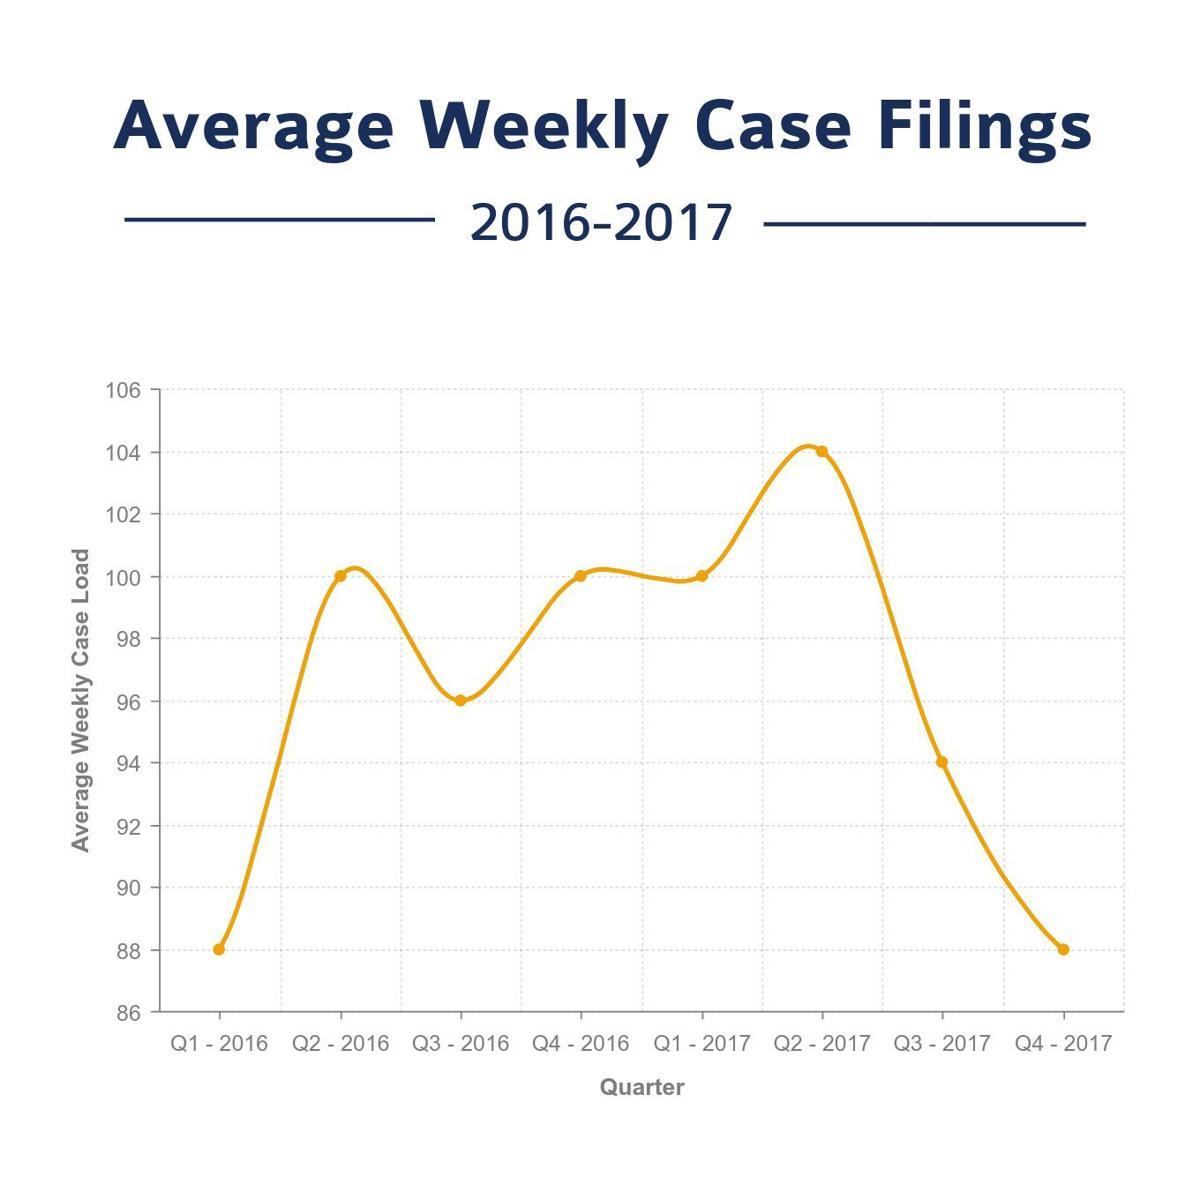 Case Filings by Quarter